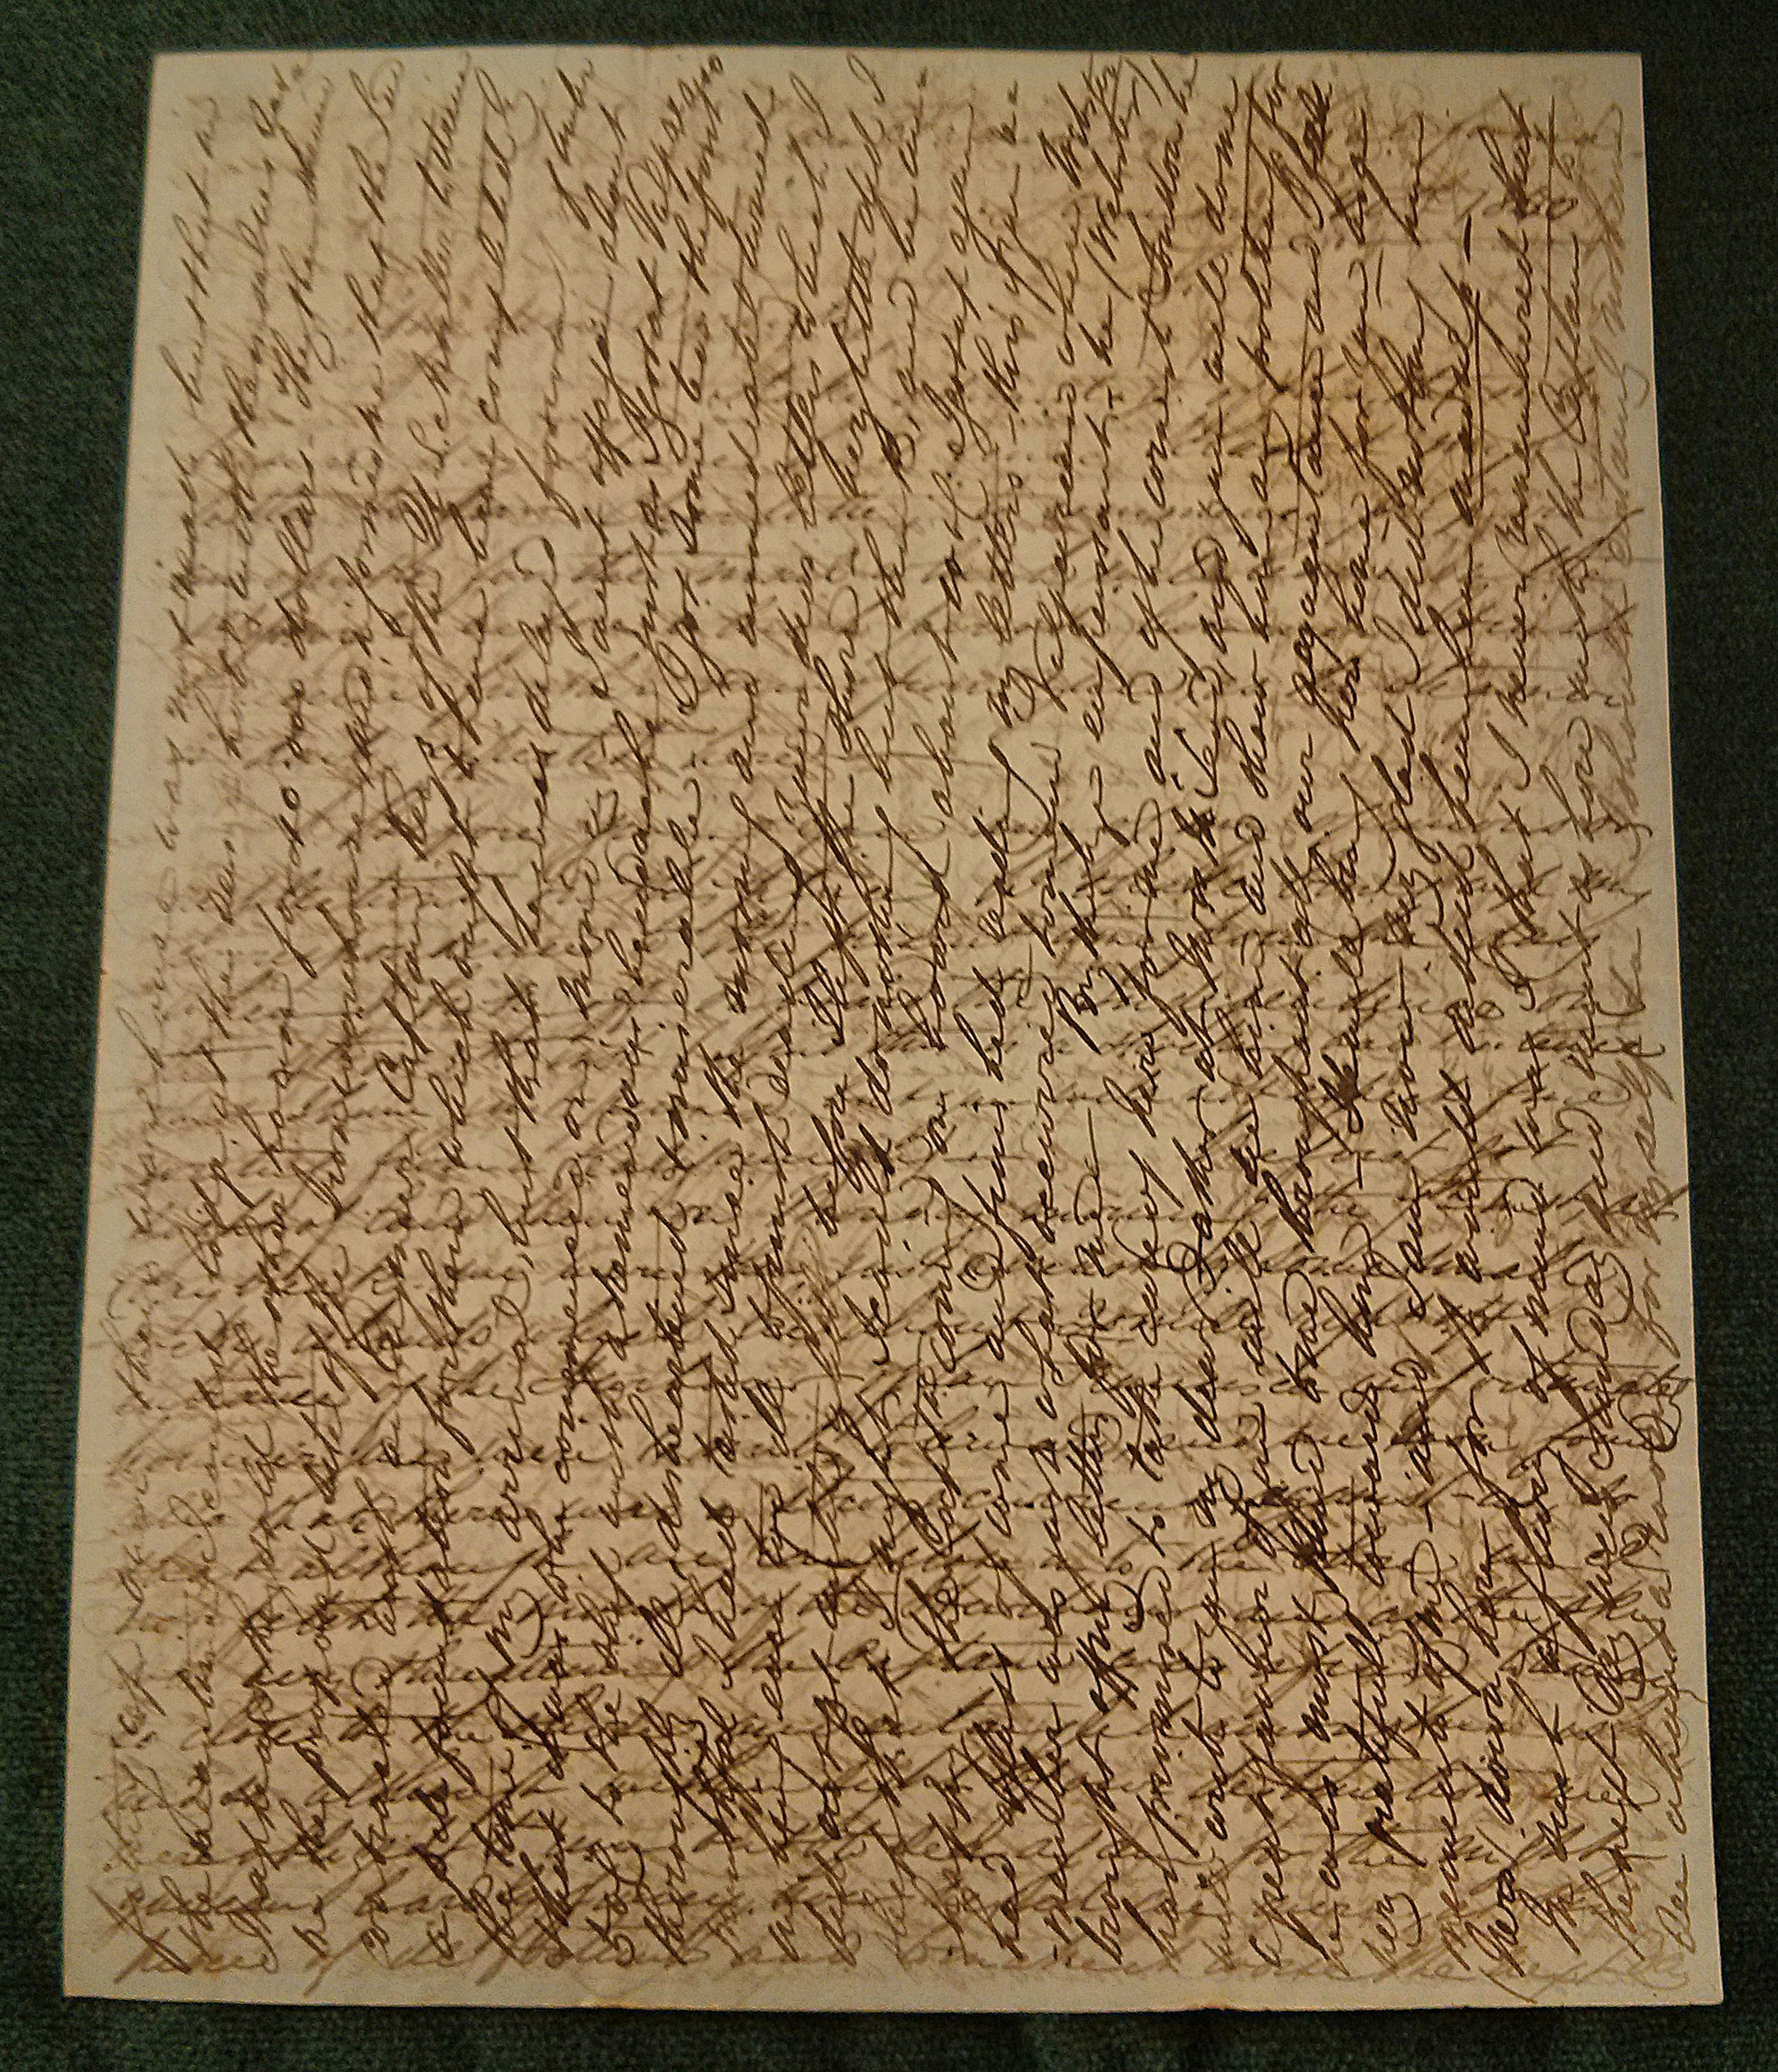 crosshatch writing